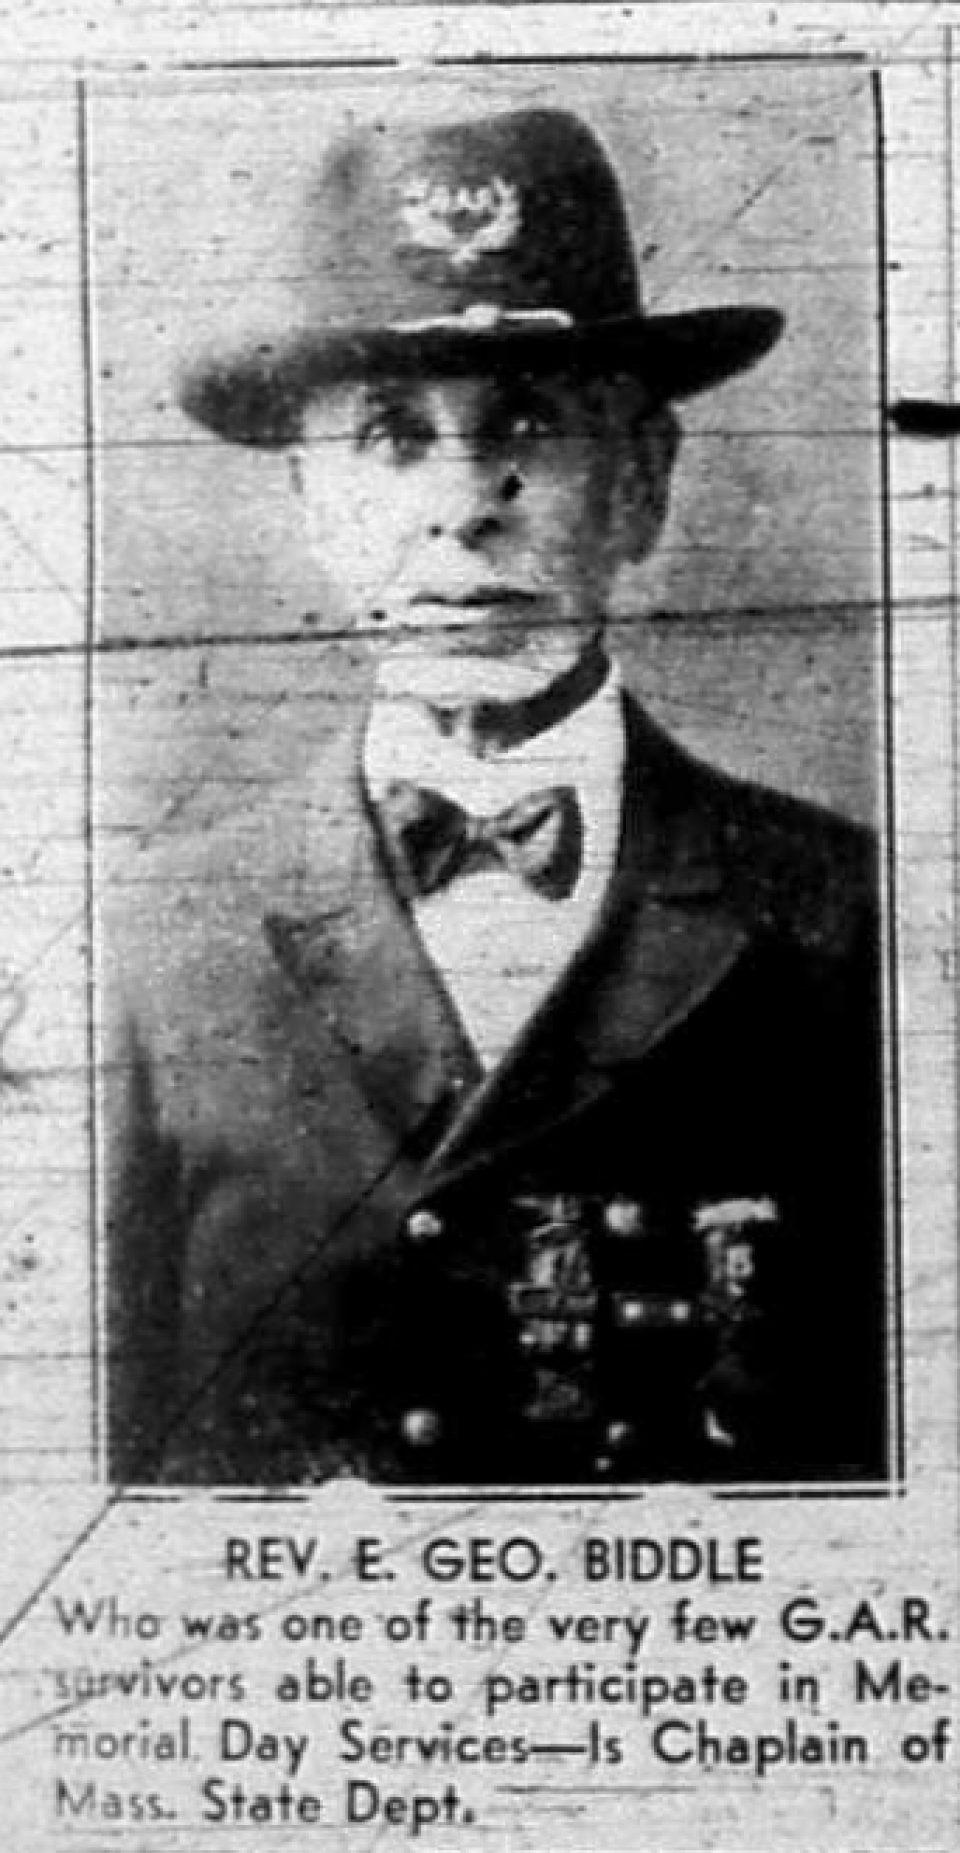 Portrait of Rev. Dr. E. George Biddle in G.A.R. uniform.